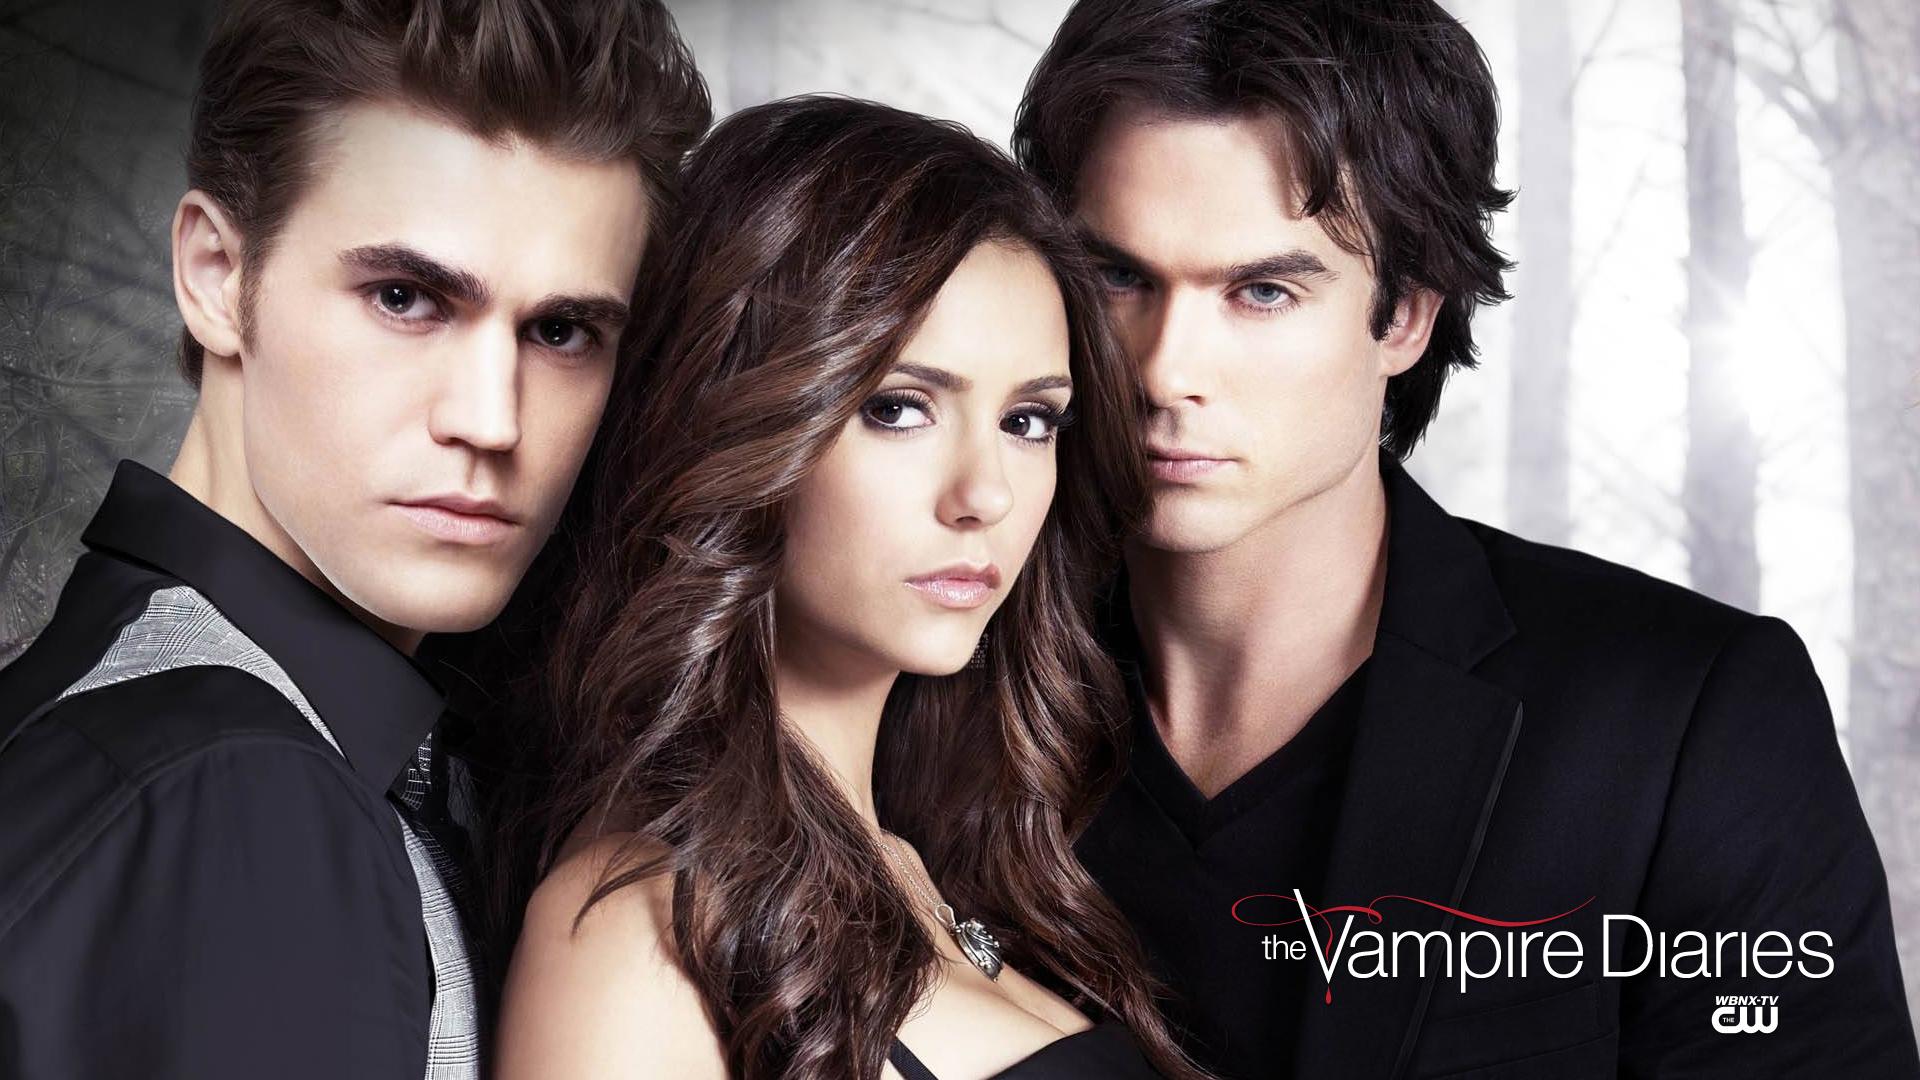 Image Cw The Vampire Diaries Hd Wallpaper Elena Gilbert Stefan